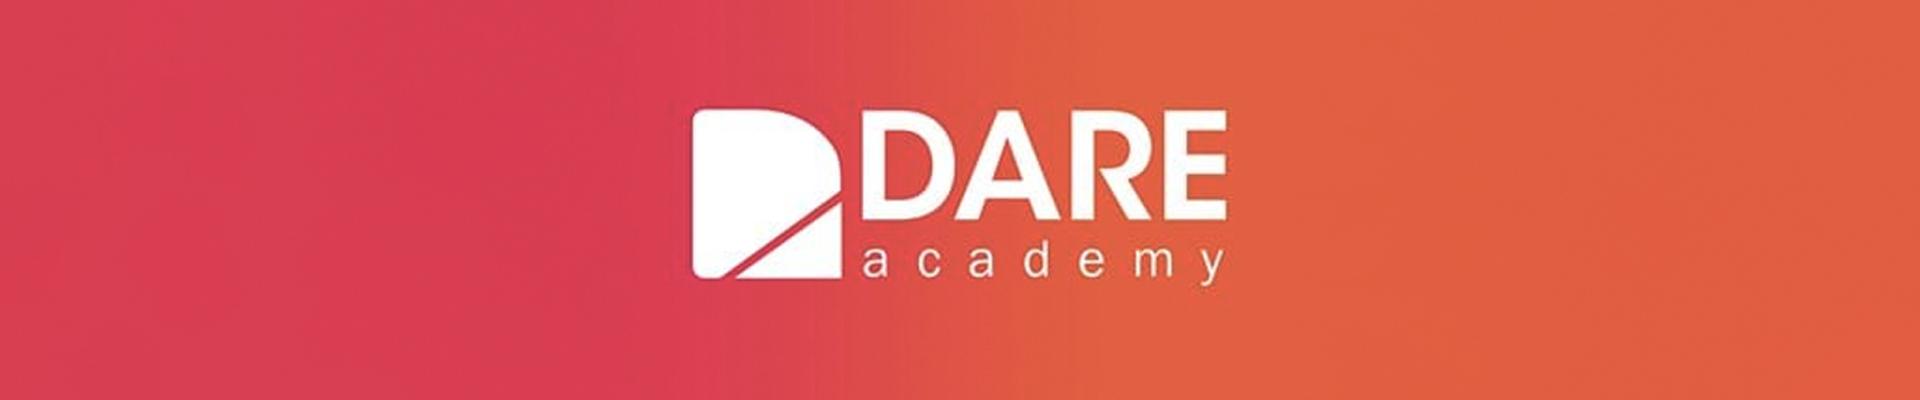 Dare Academy Logo